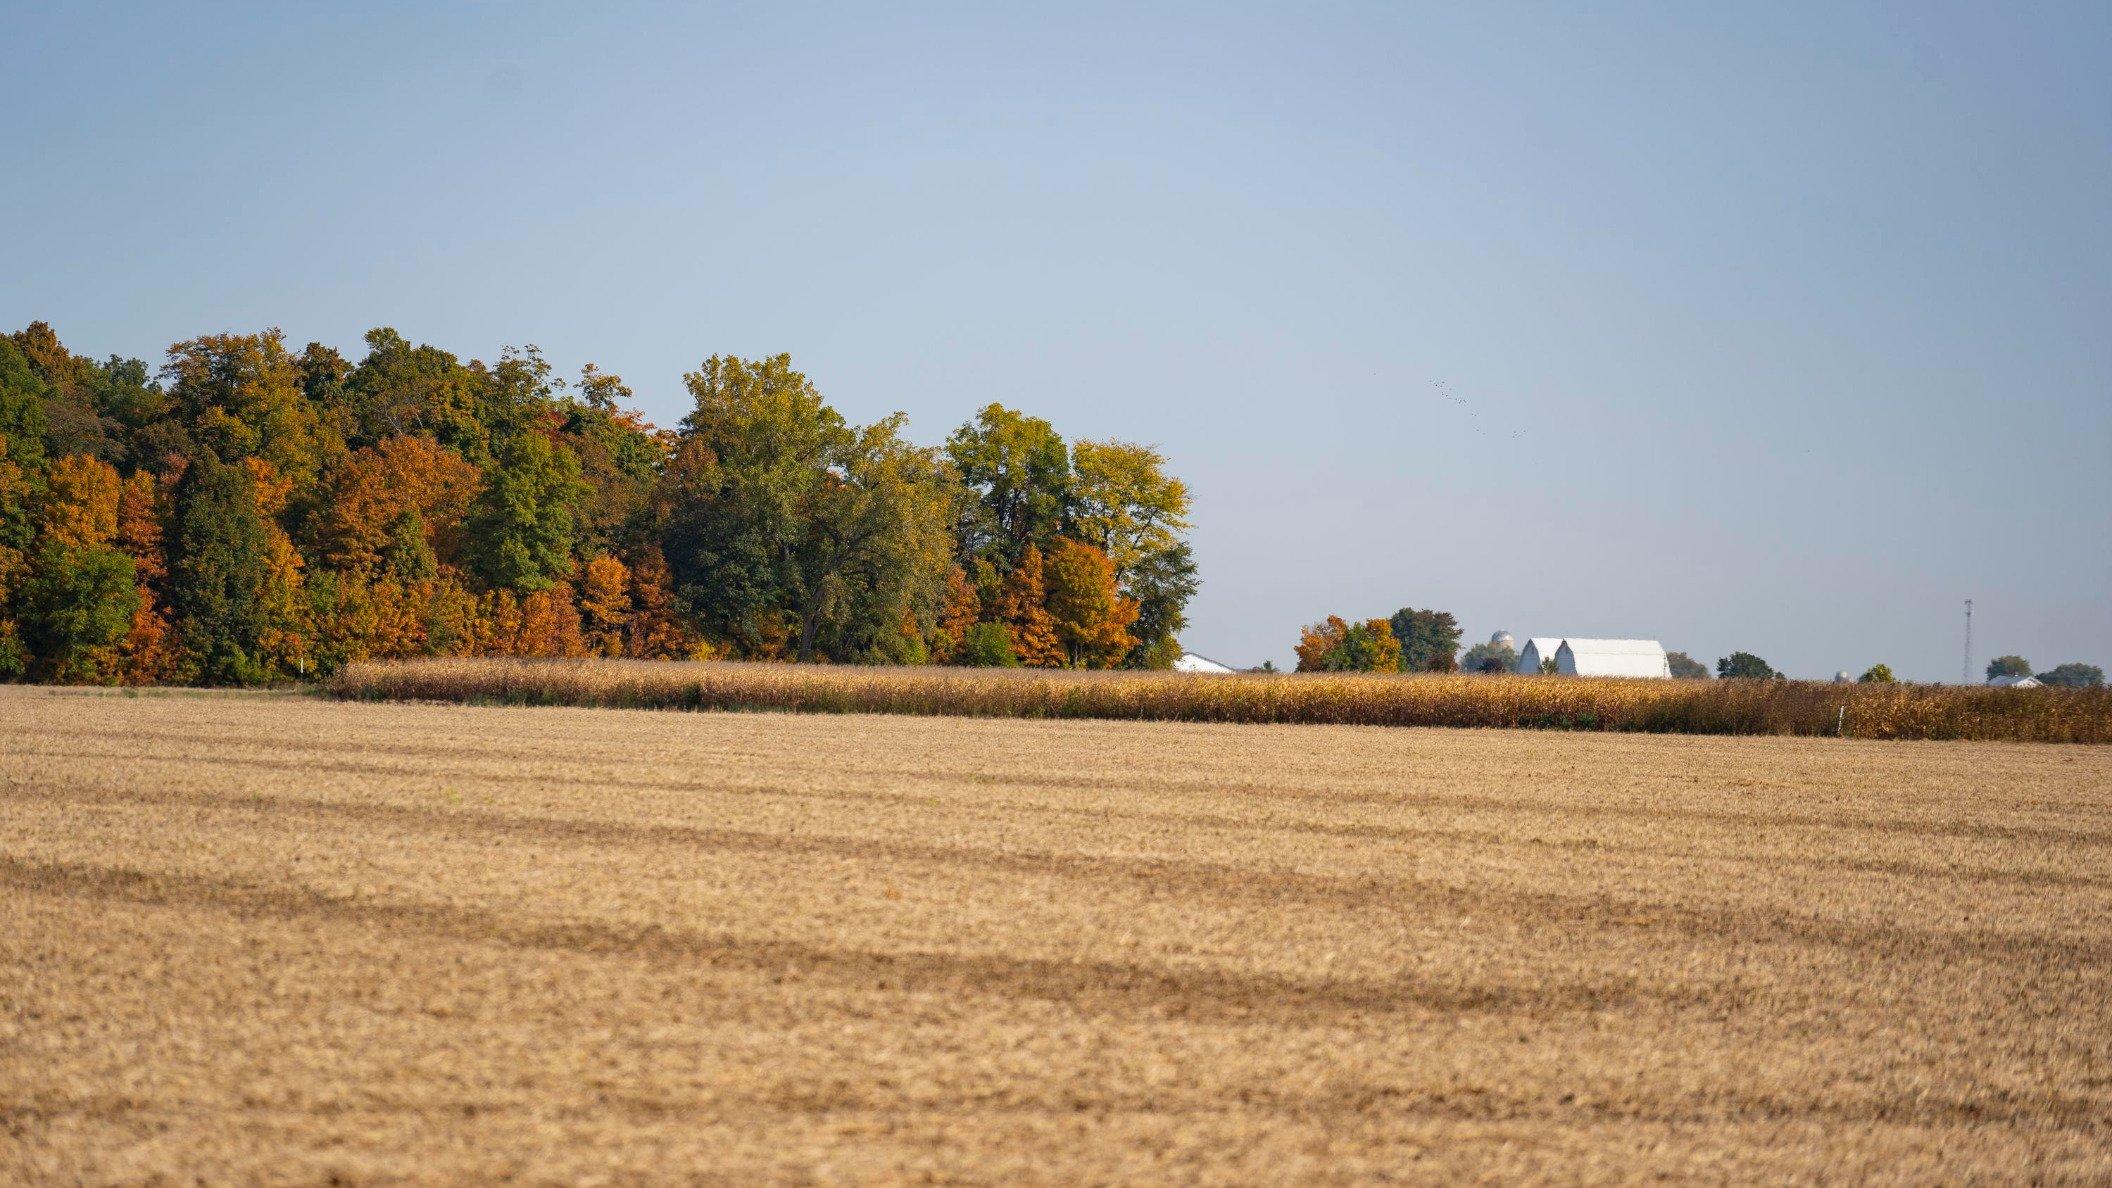 2020 Fall harvest Ohio